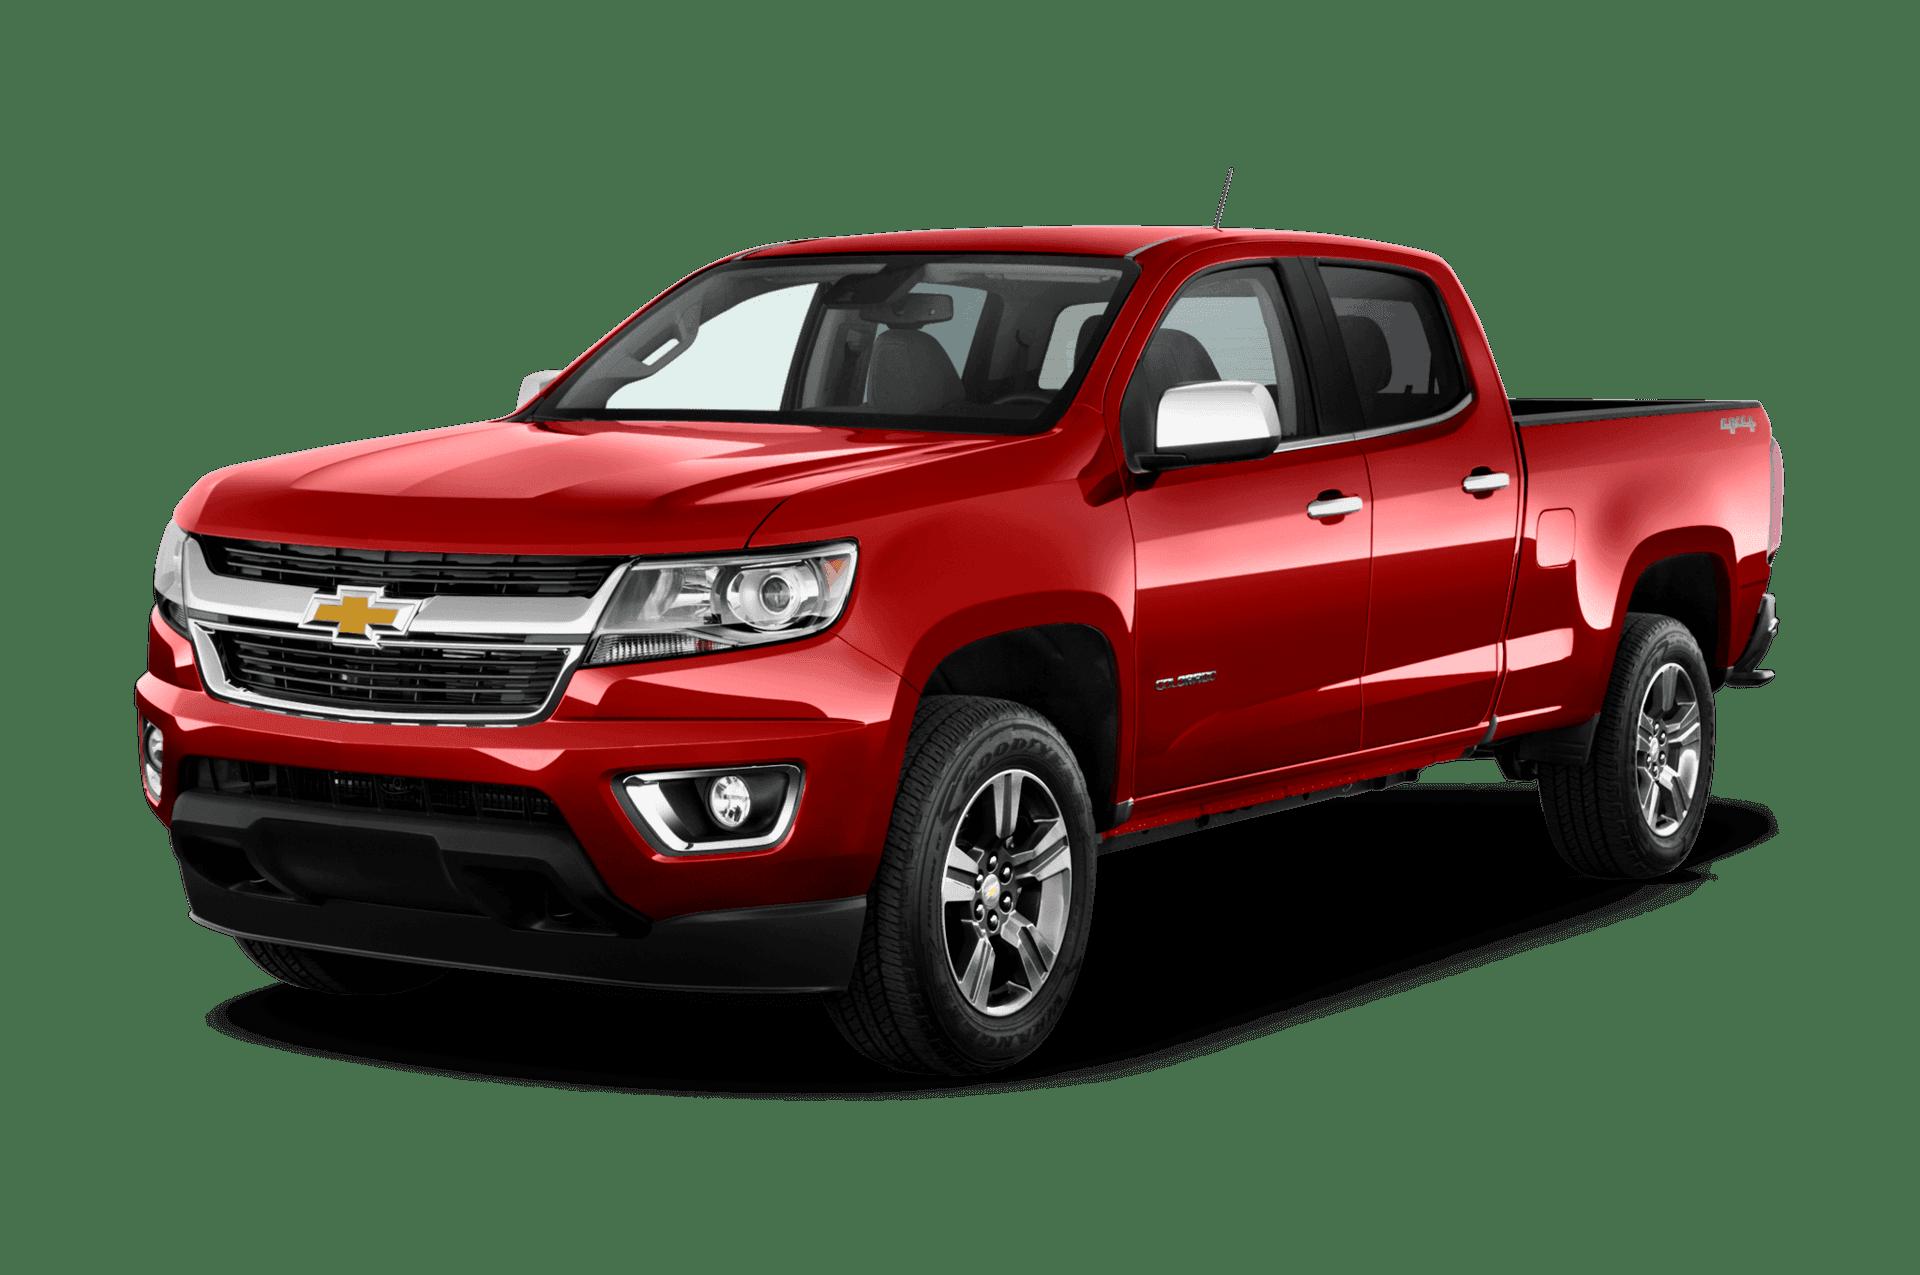 A red Chevrolet Colorado